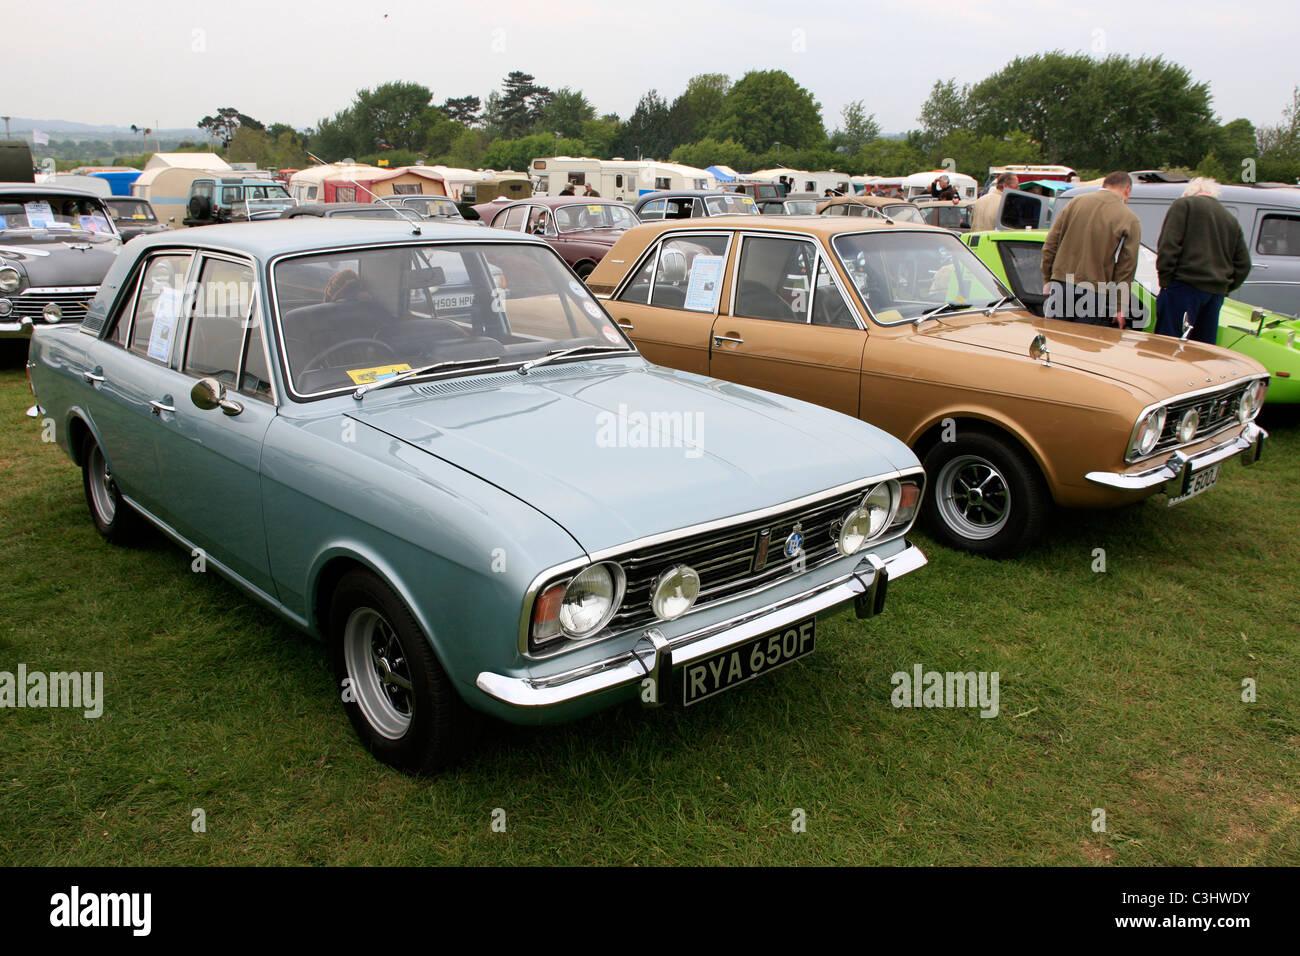 a vintage 1960s english ford cortina mk2 cars stock photo